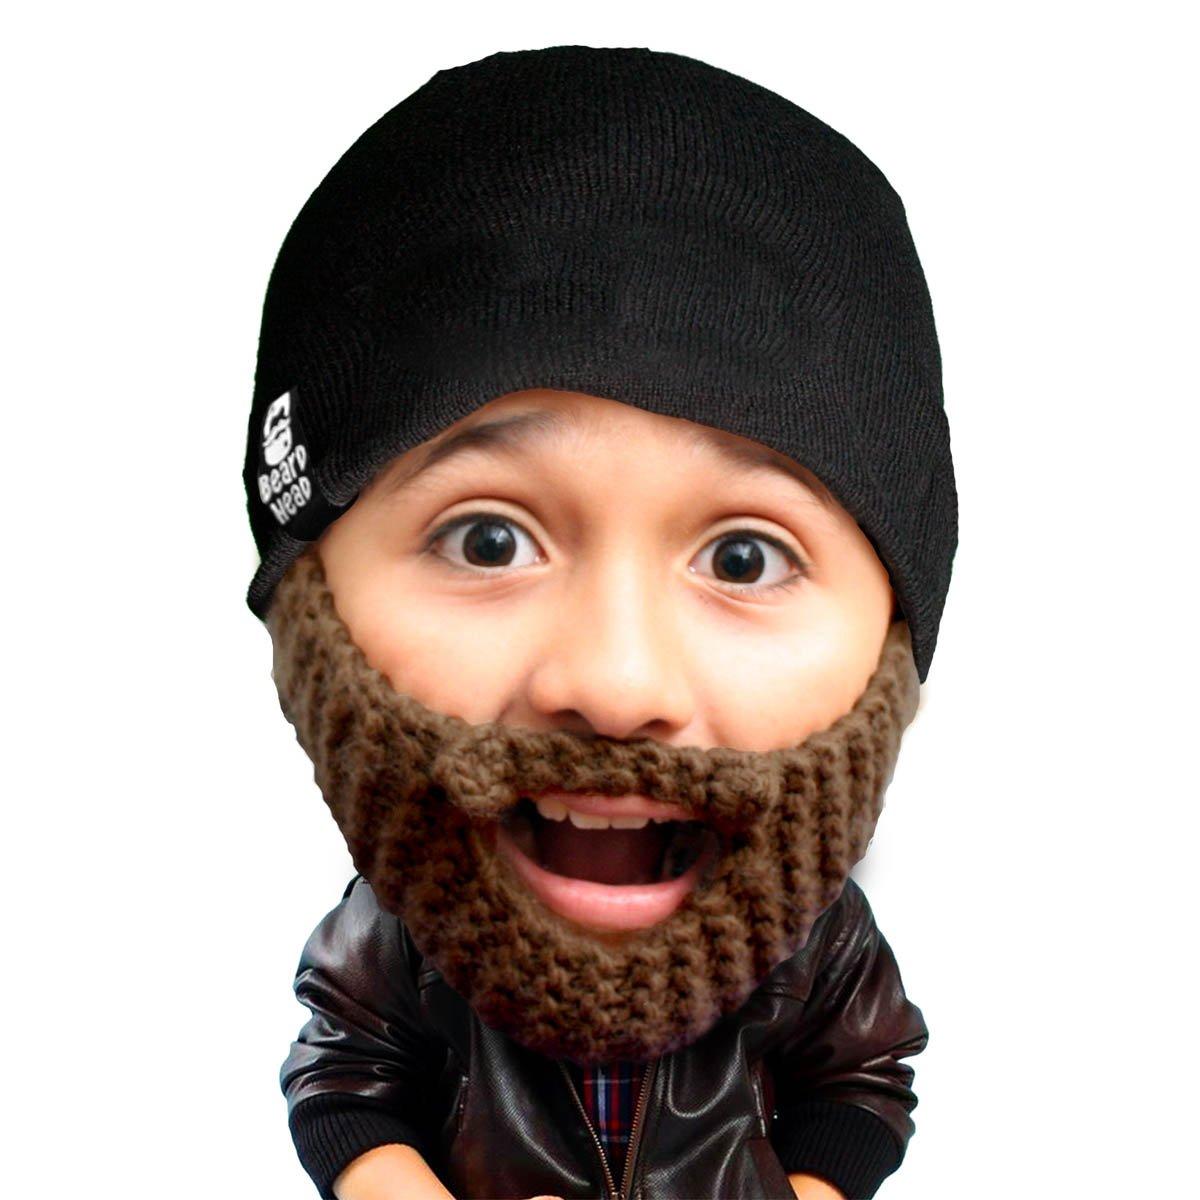 Knit Hat and Fake Beard for Kids Toddlers Beard Head Kid Populous Beard Beanie